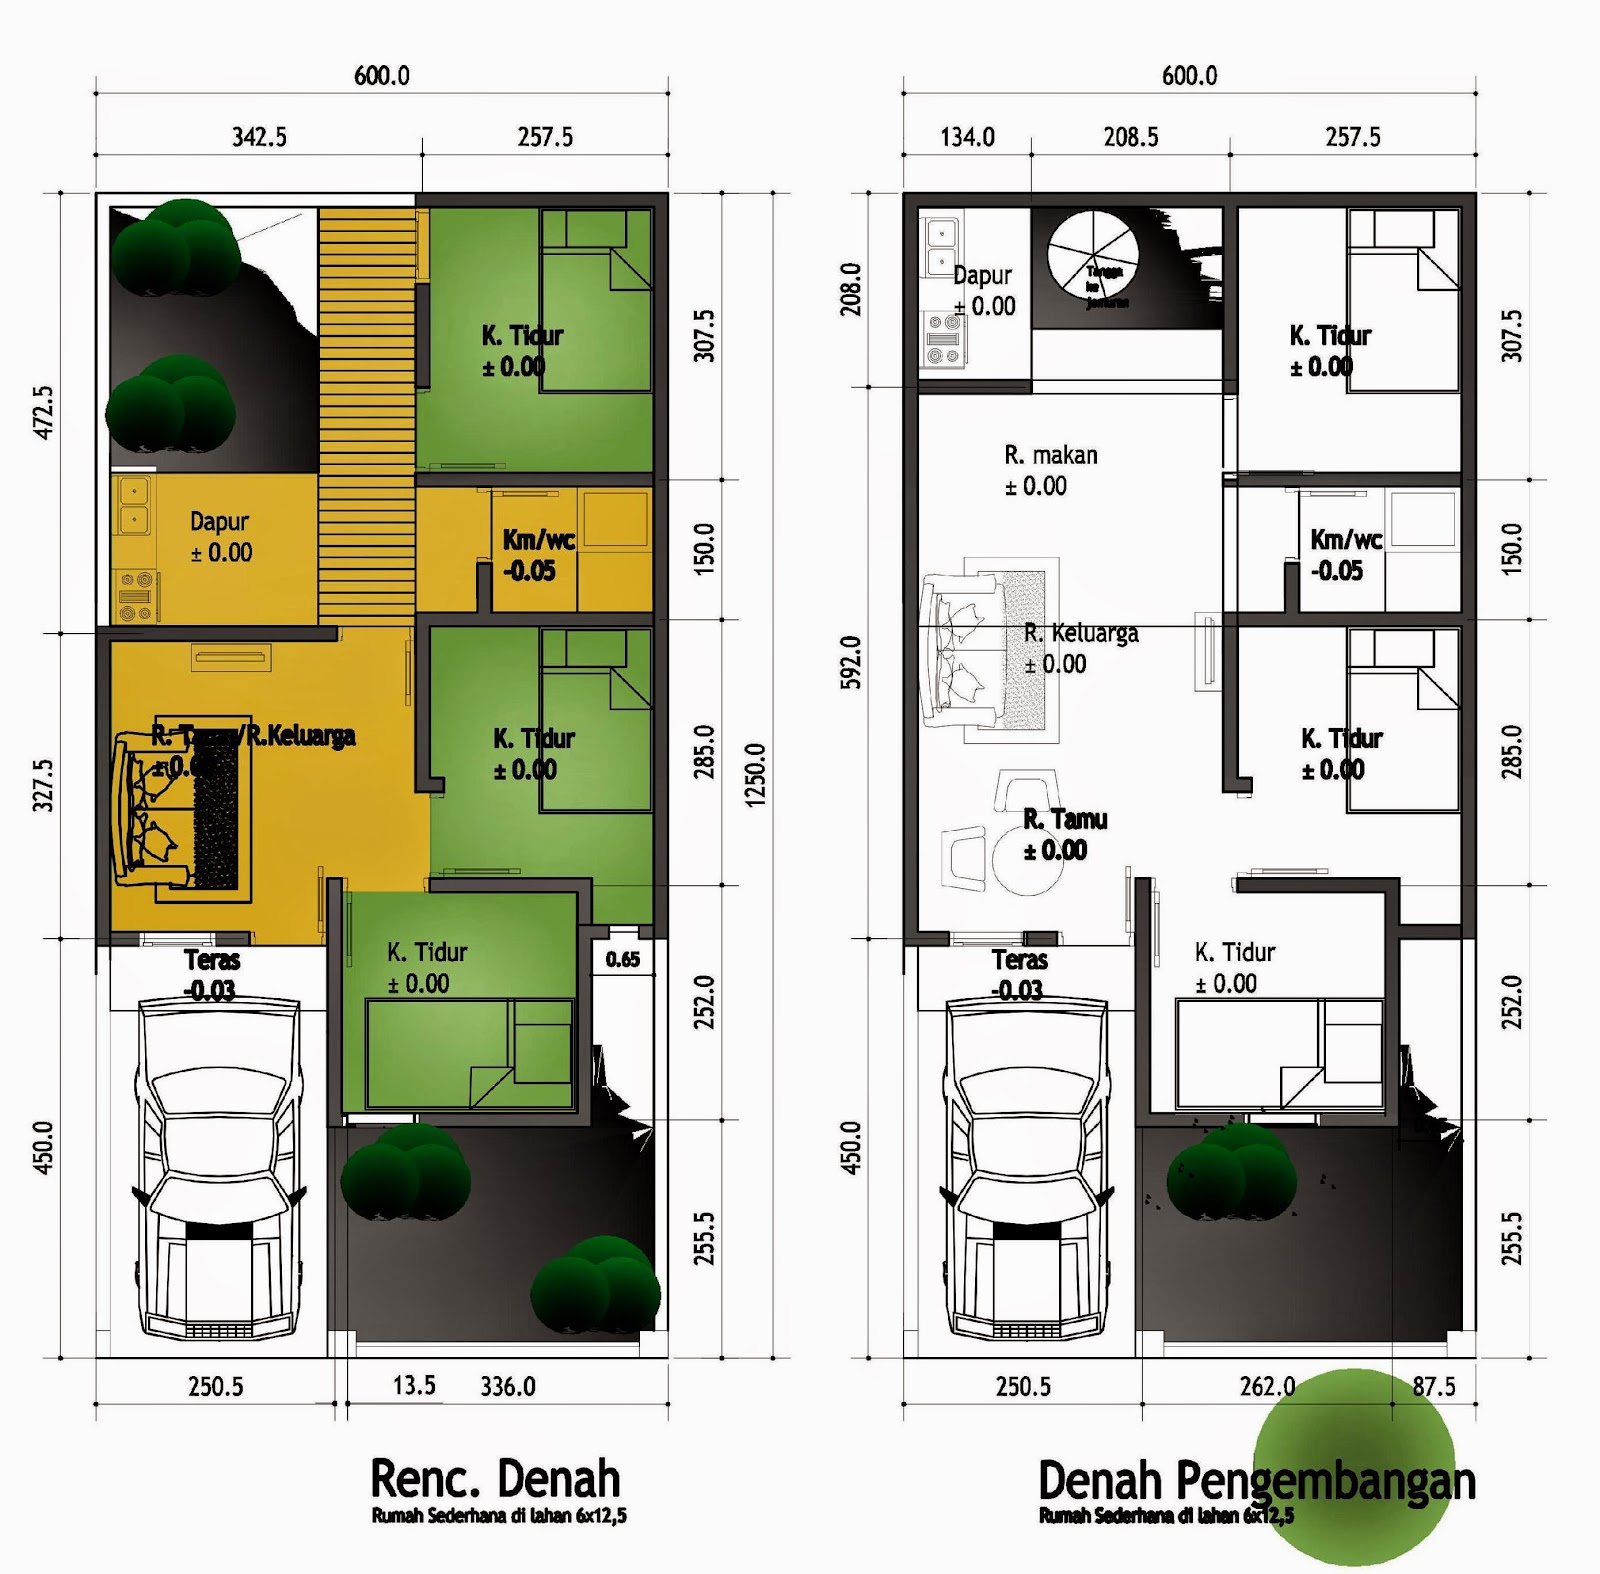 contoh denah rumah minimalis terbaru 2015Kelstudio